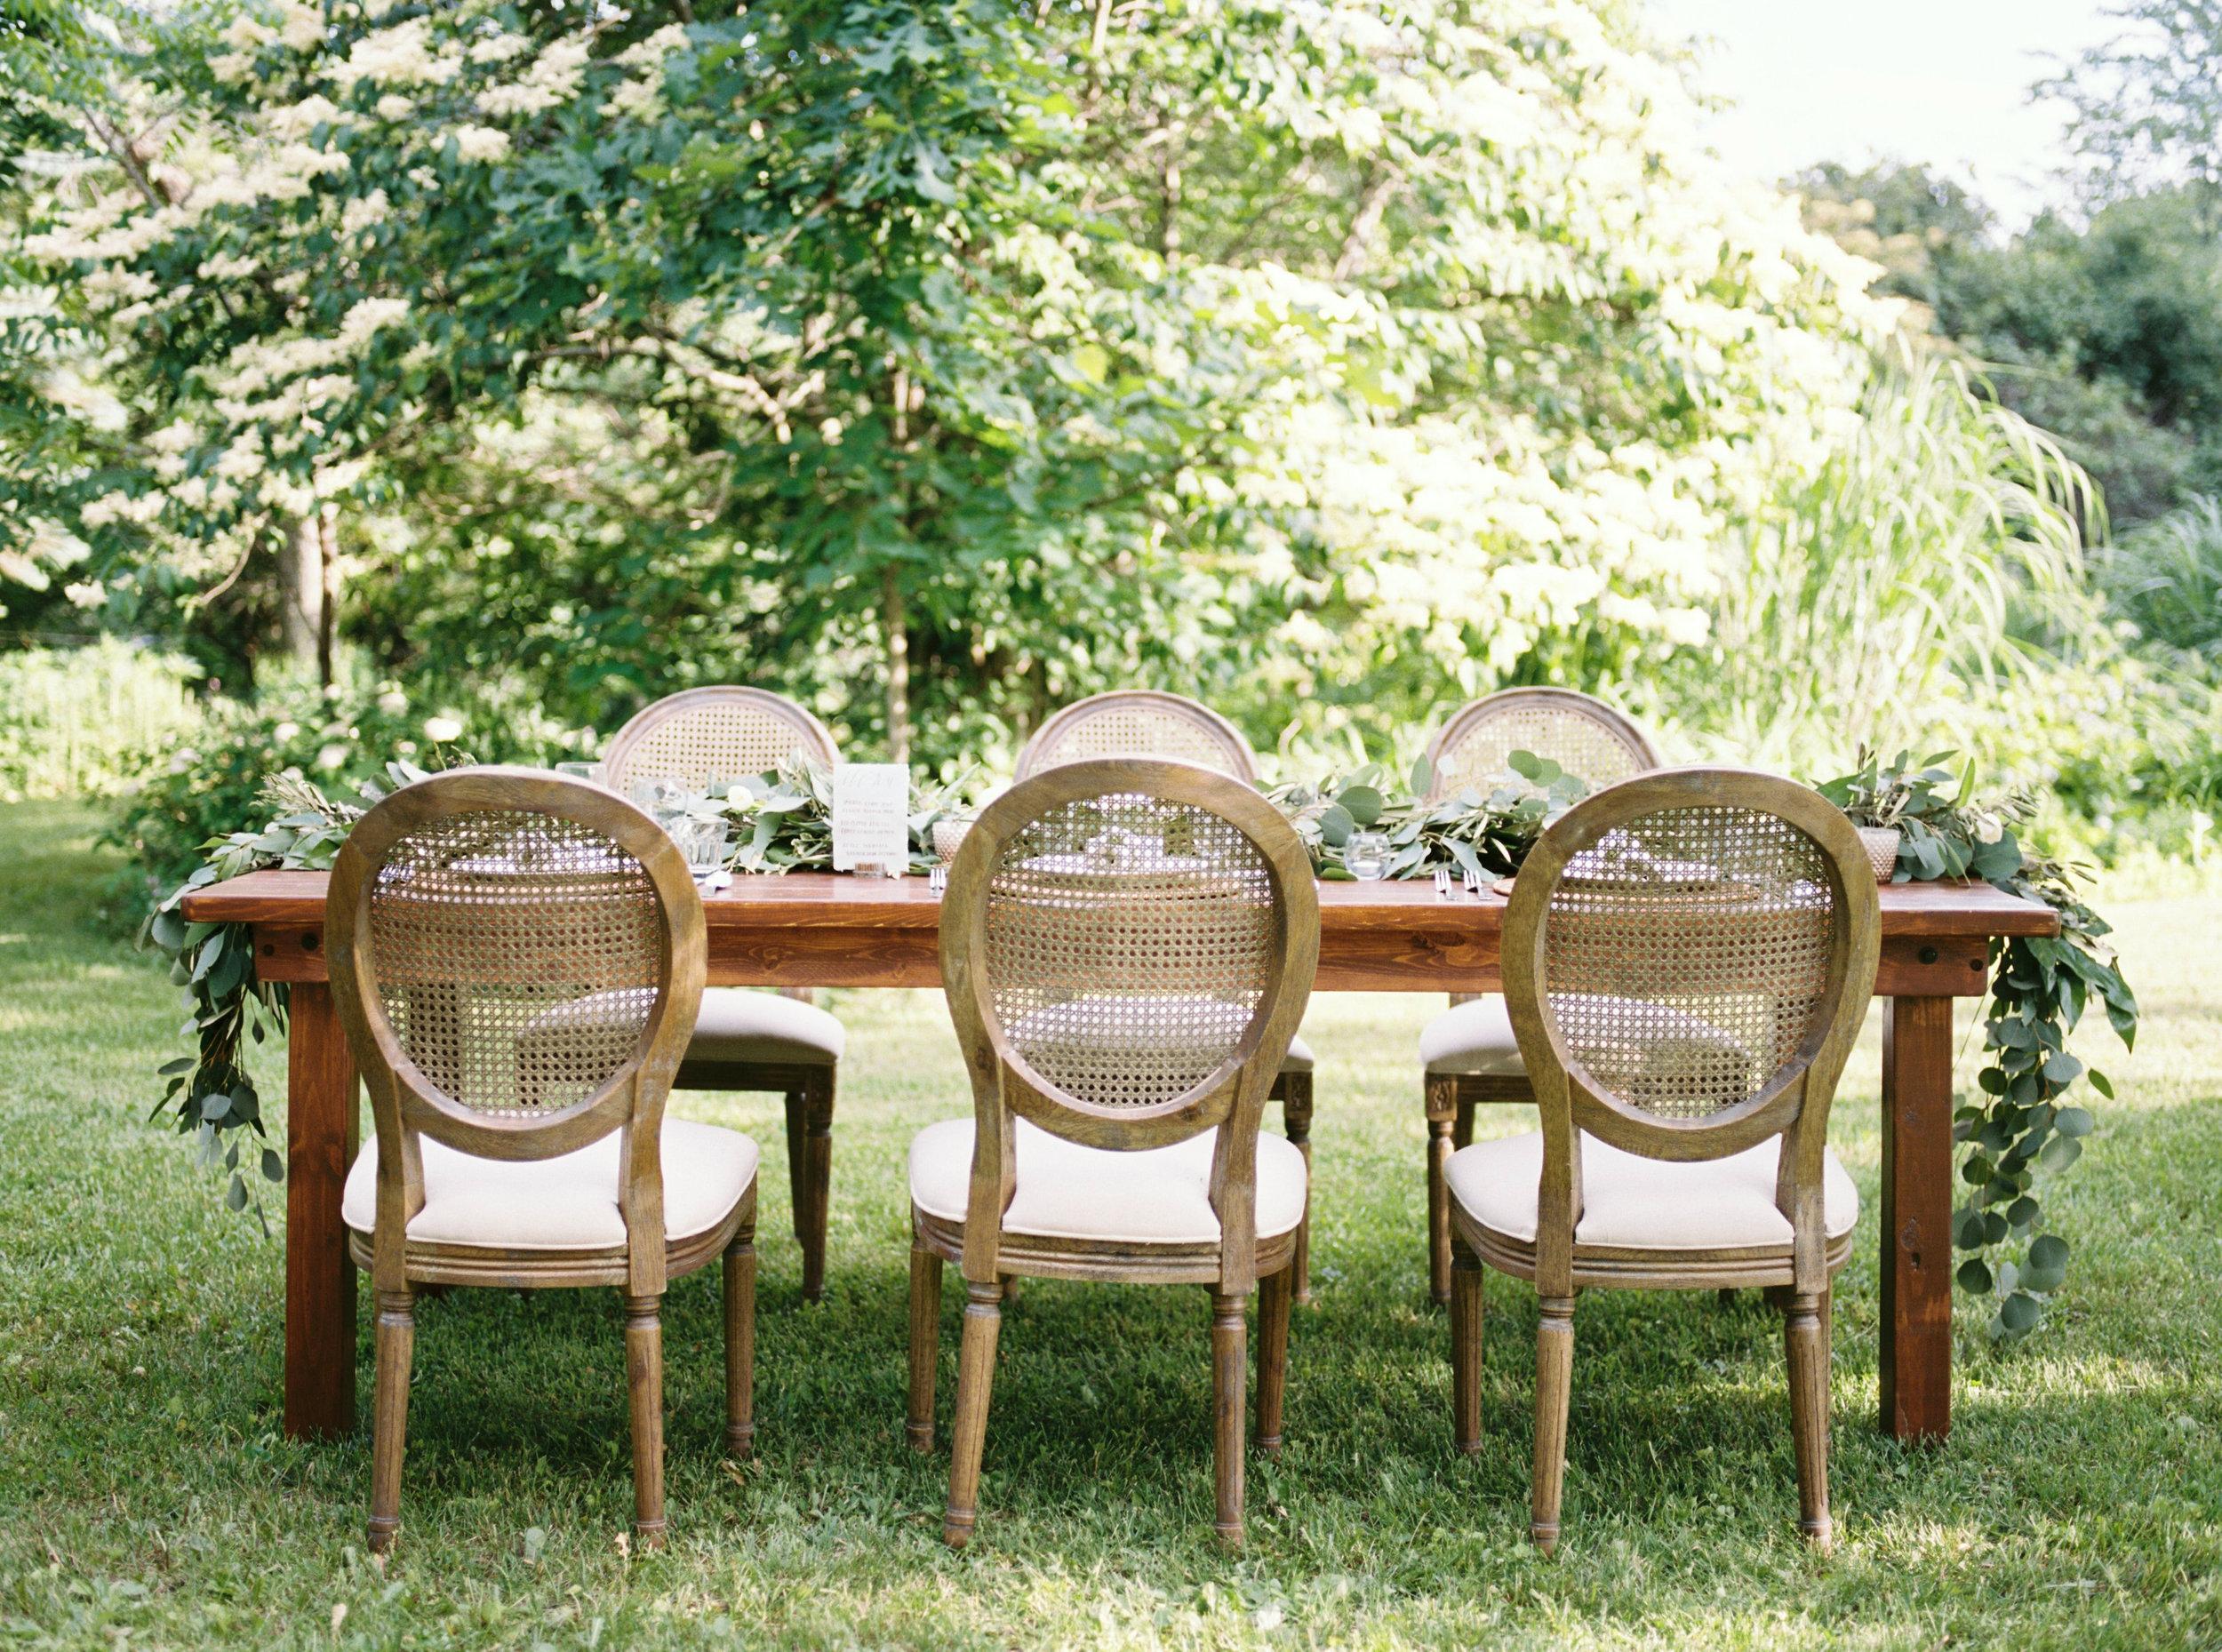 greenhouse-wedding-inspiration-by-laurelyn-savannah-photography-1.jpg